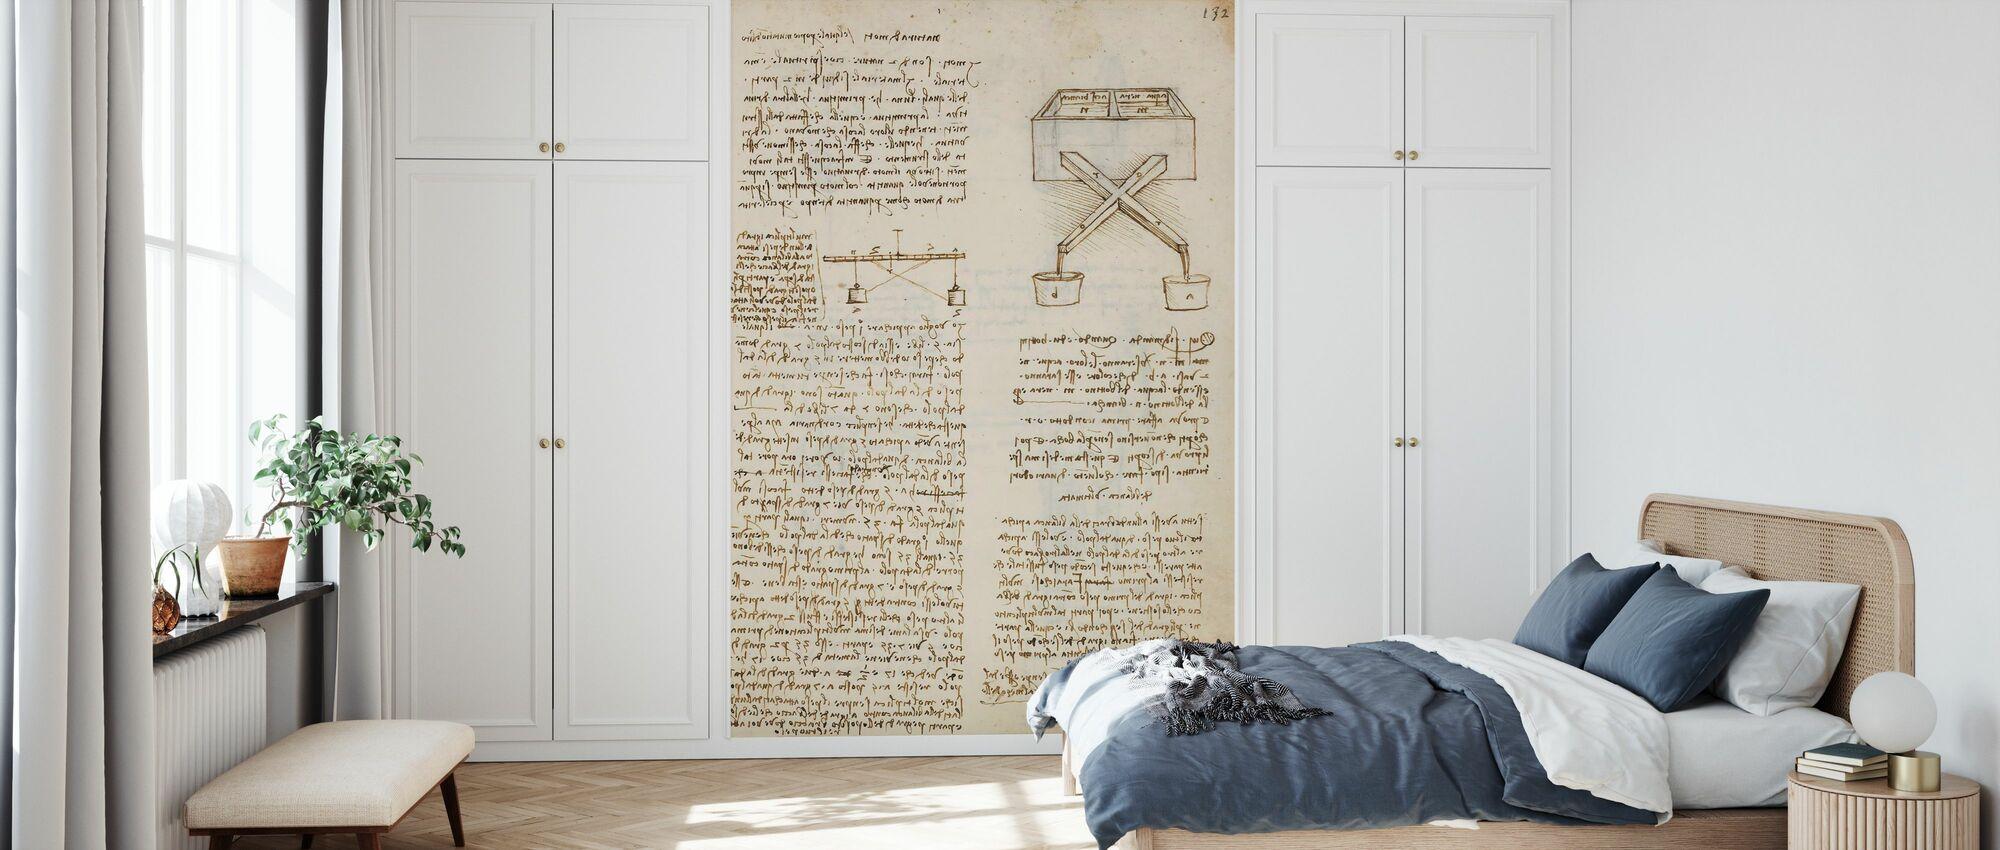 Codex Madrid III - Leonardo da Vinci - Wallpaper - Bedroom